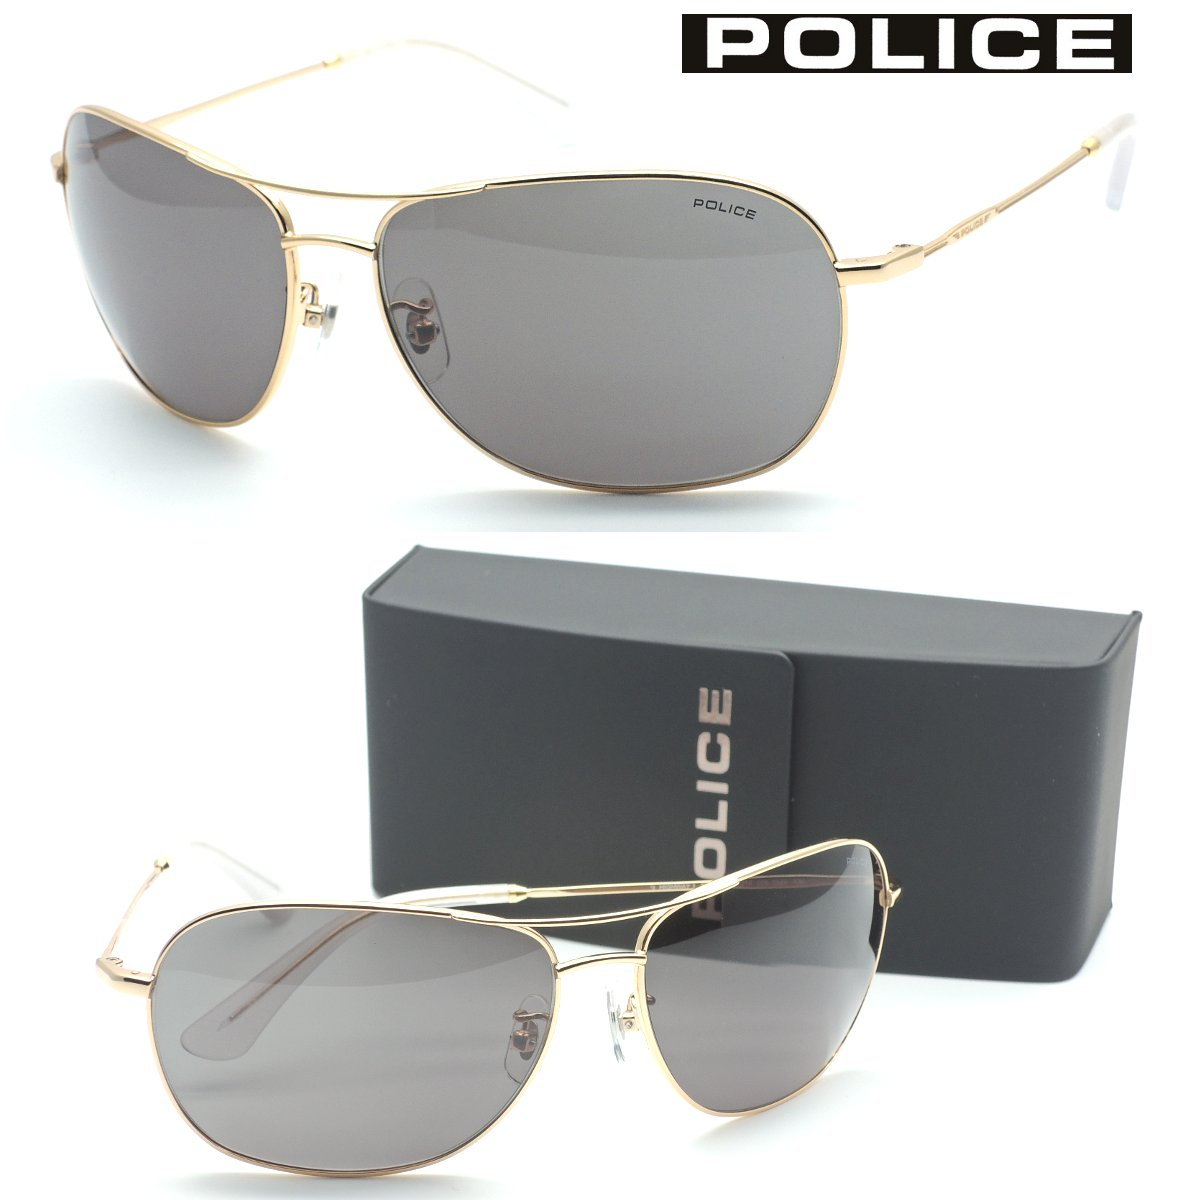 【POLICE】ポリス サングラス SPL358I col.0349 Made in Italy【国内正規品】【店内全品送料無料】メンズ ユニセックス